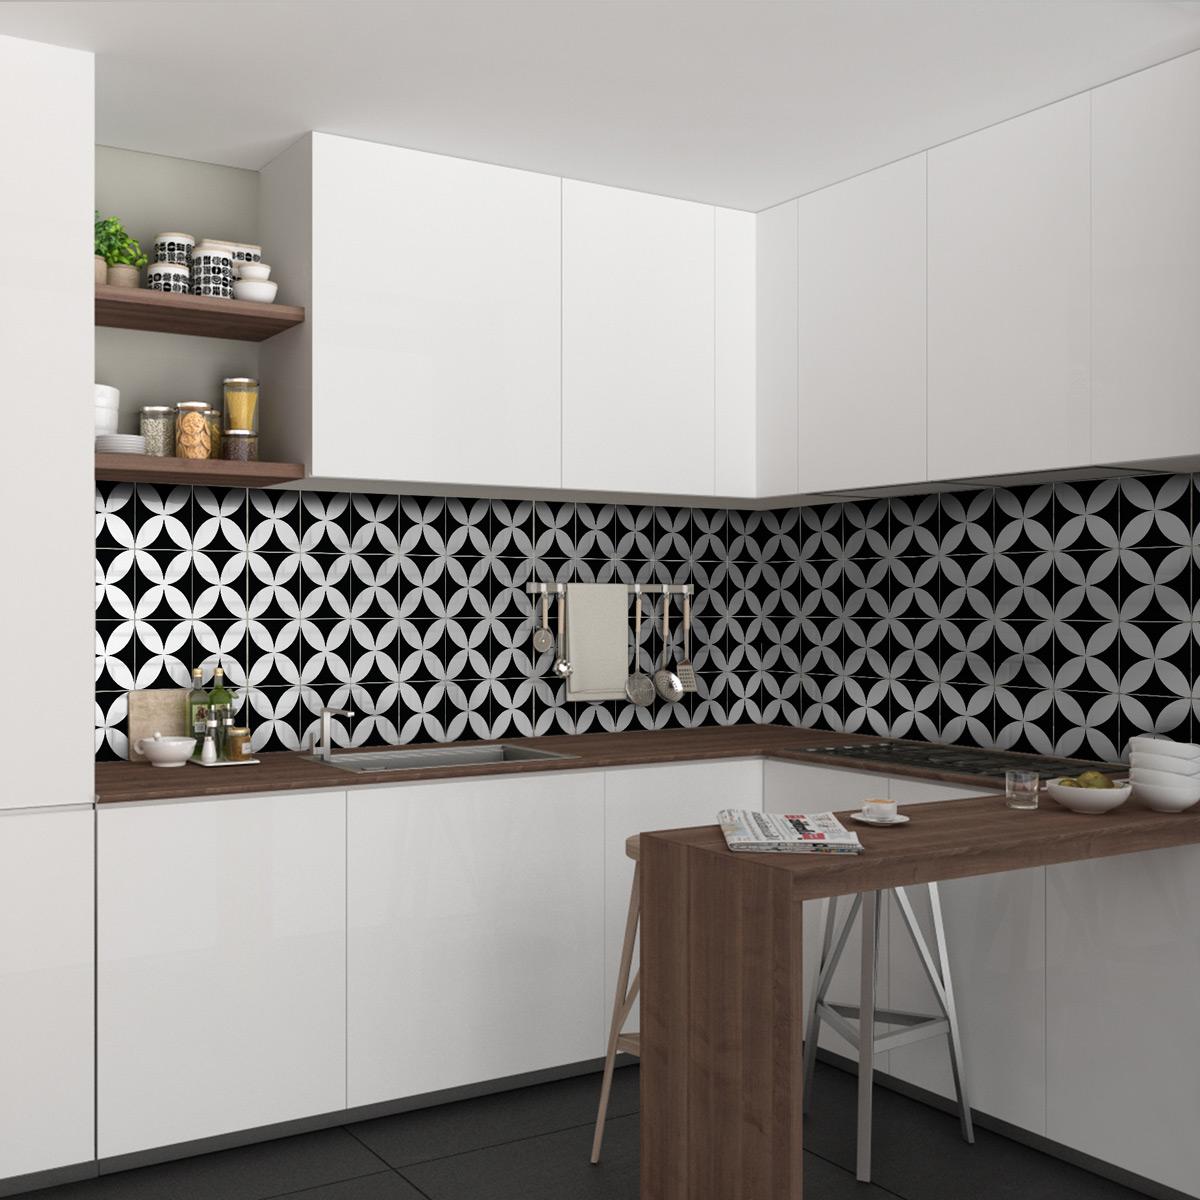 30 stickers carreaux de ciment azulejos benigno cuisine carrelages ambiance sticker. Black Bedroom Furniture Sets. Home Design Ideas